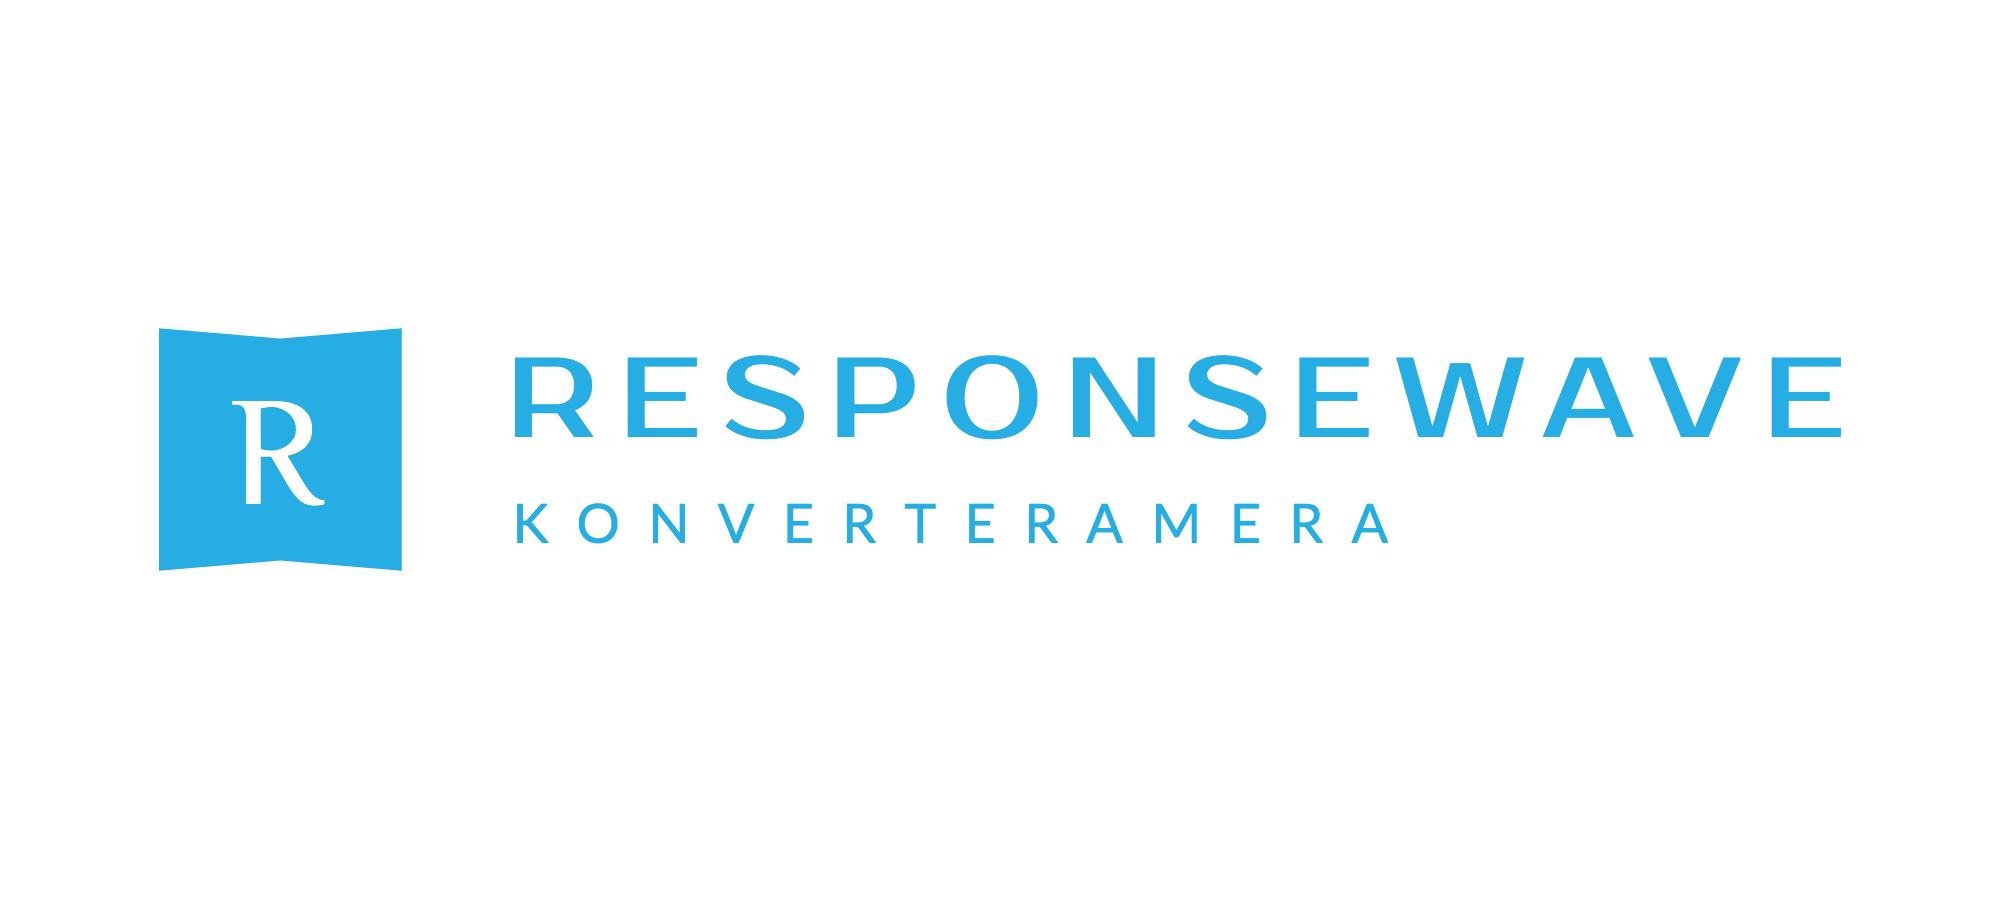 Responsewave